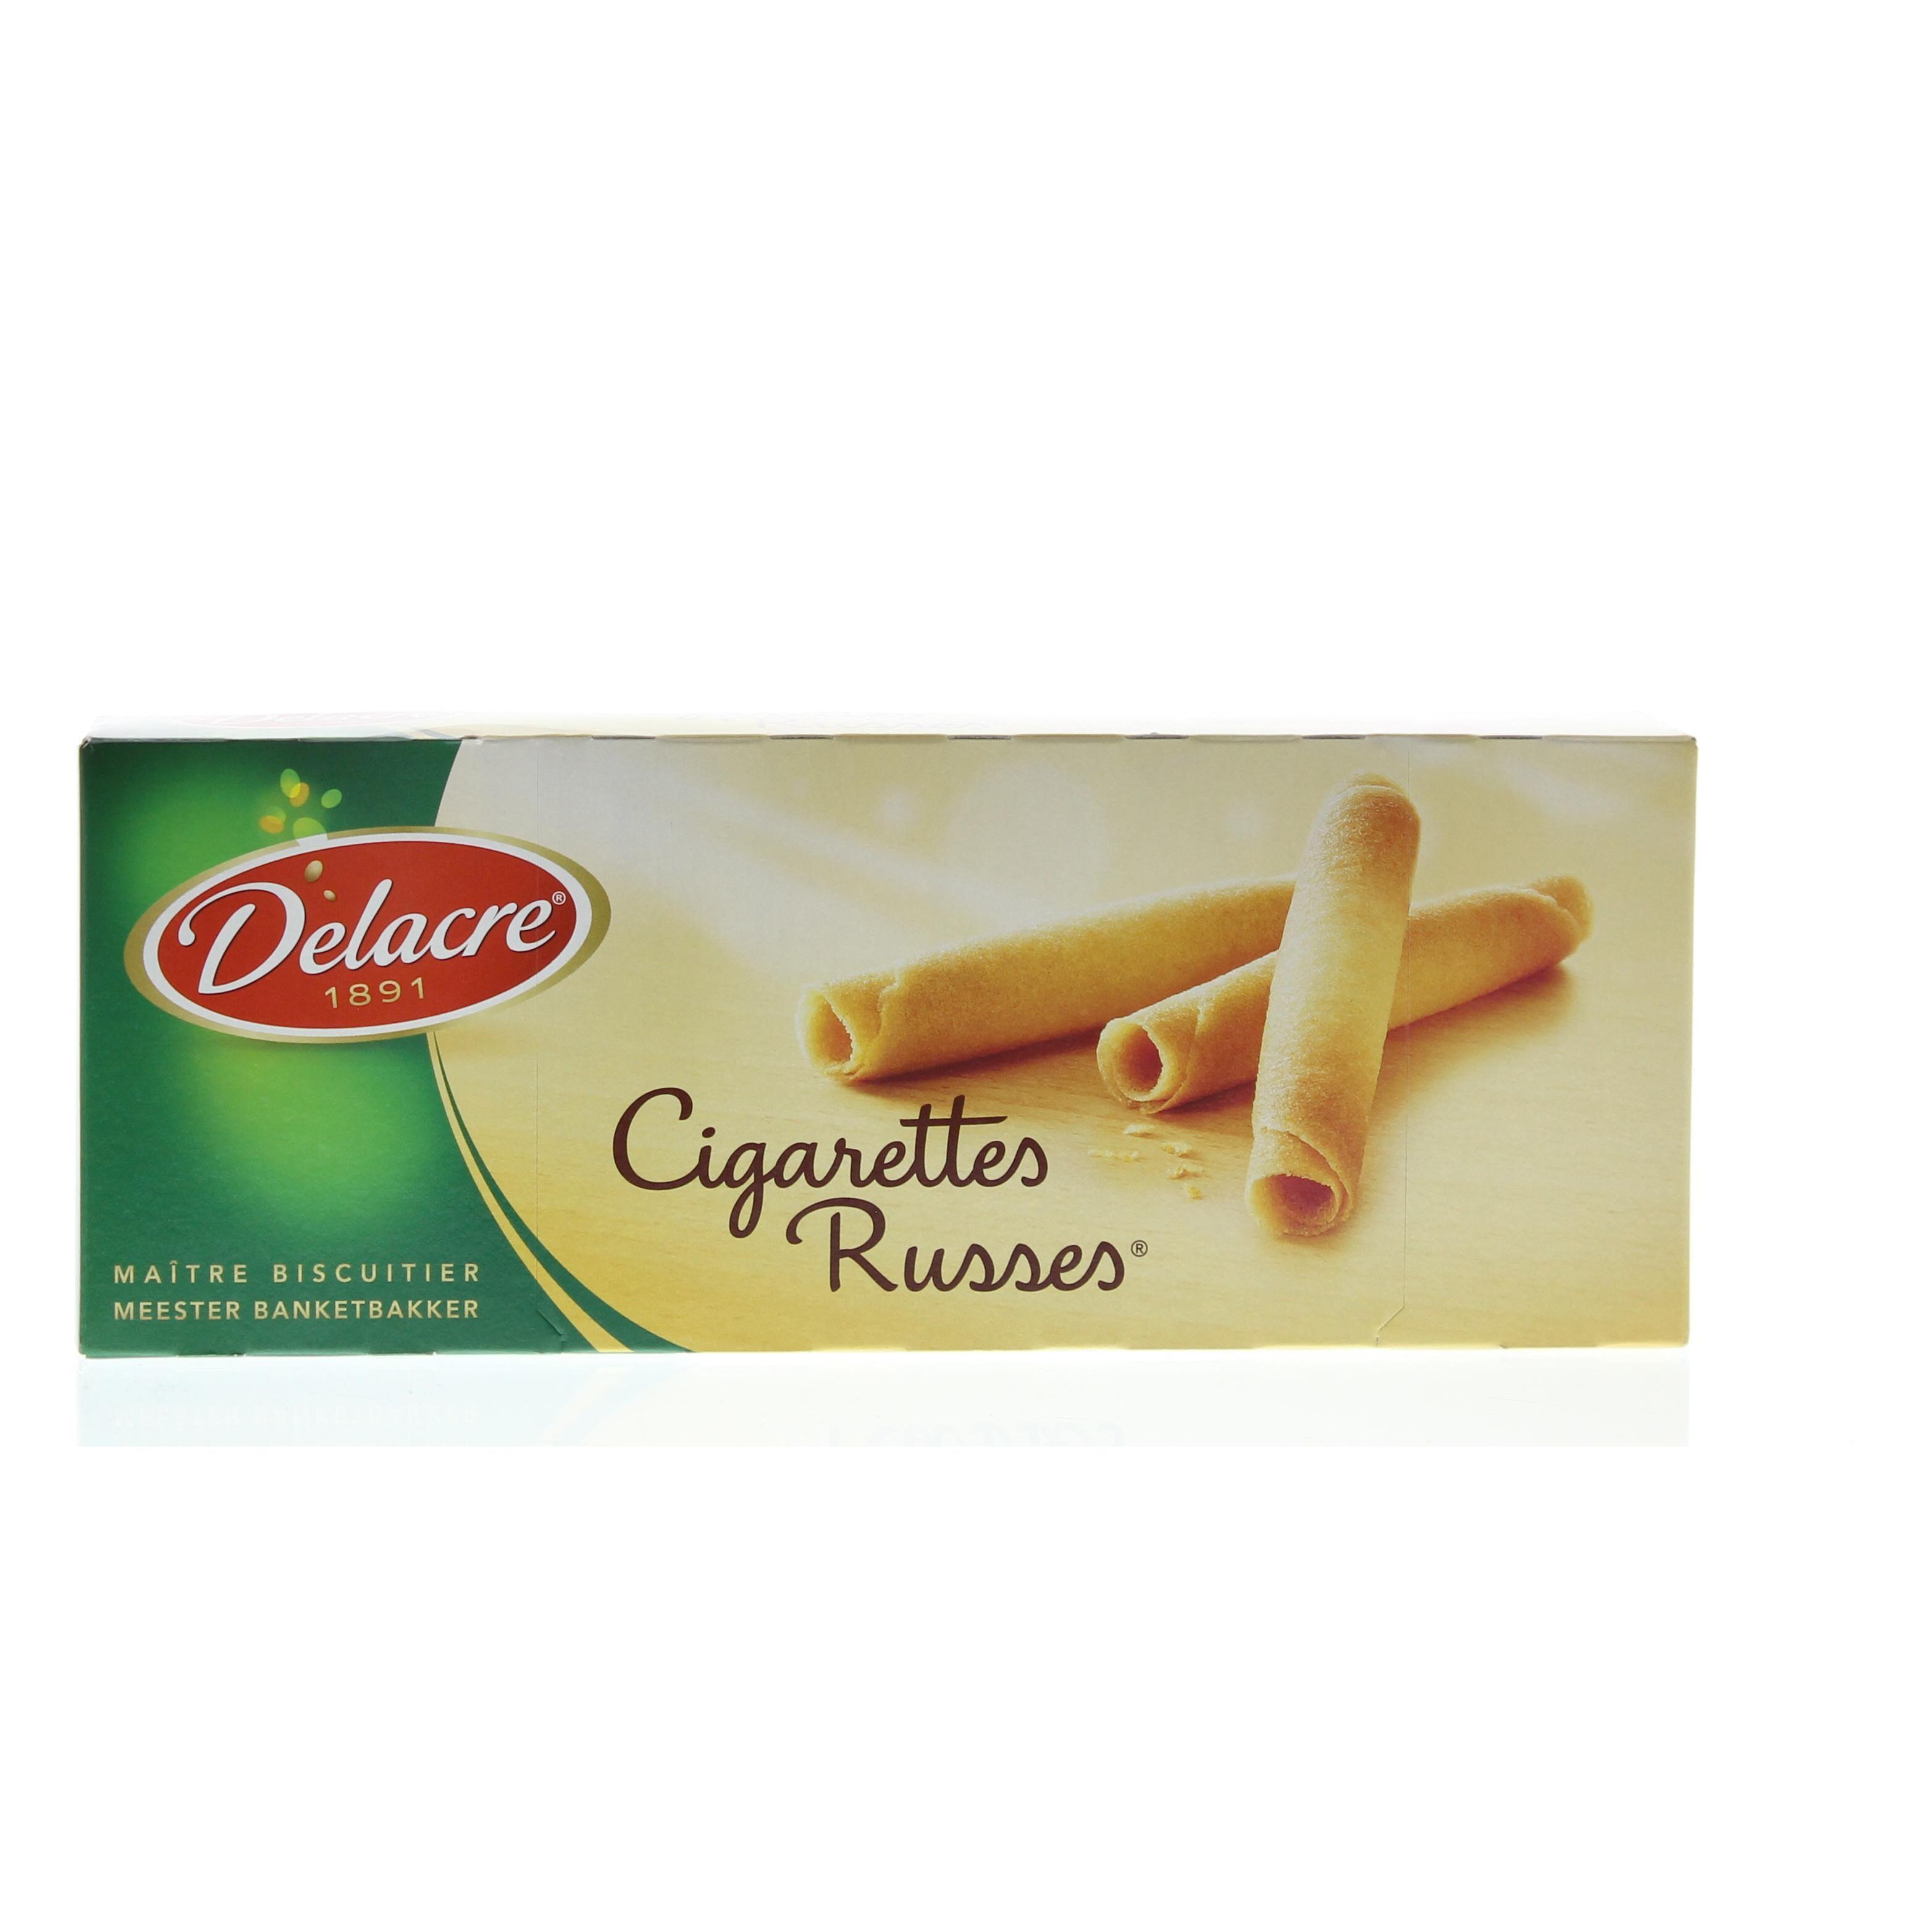 Delacre - Cigarettes Russes Gebäckrollen - 200g